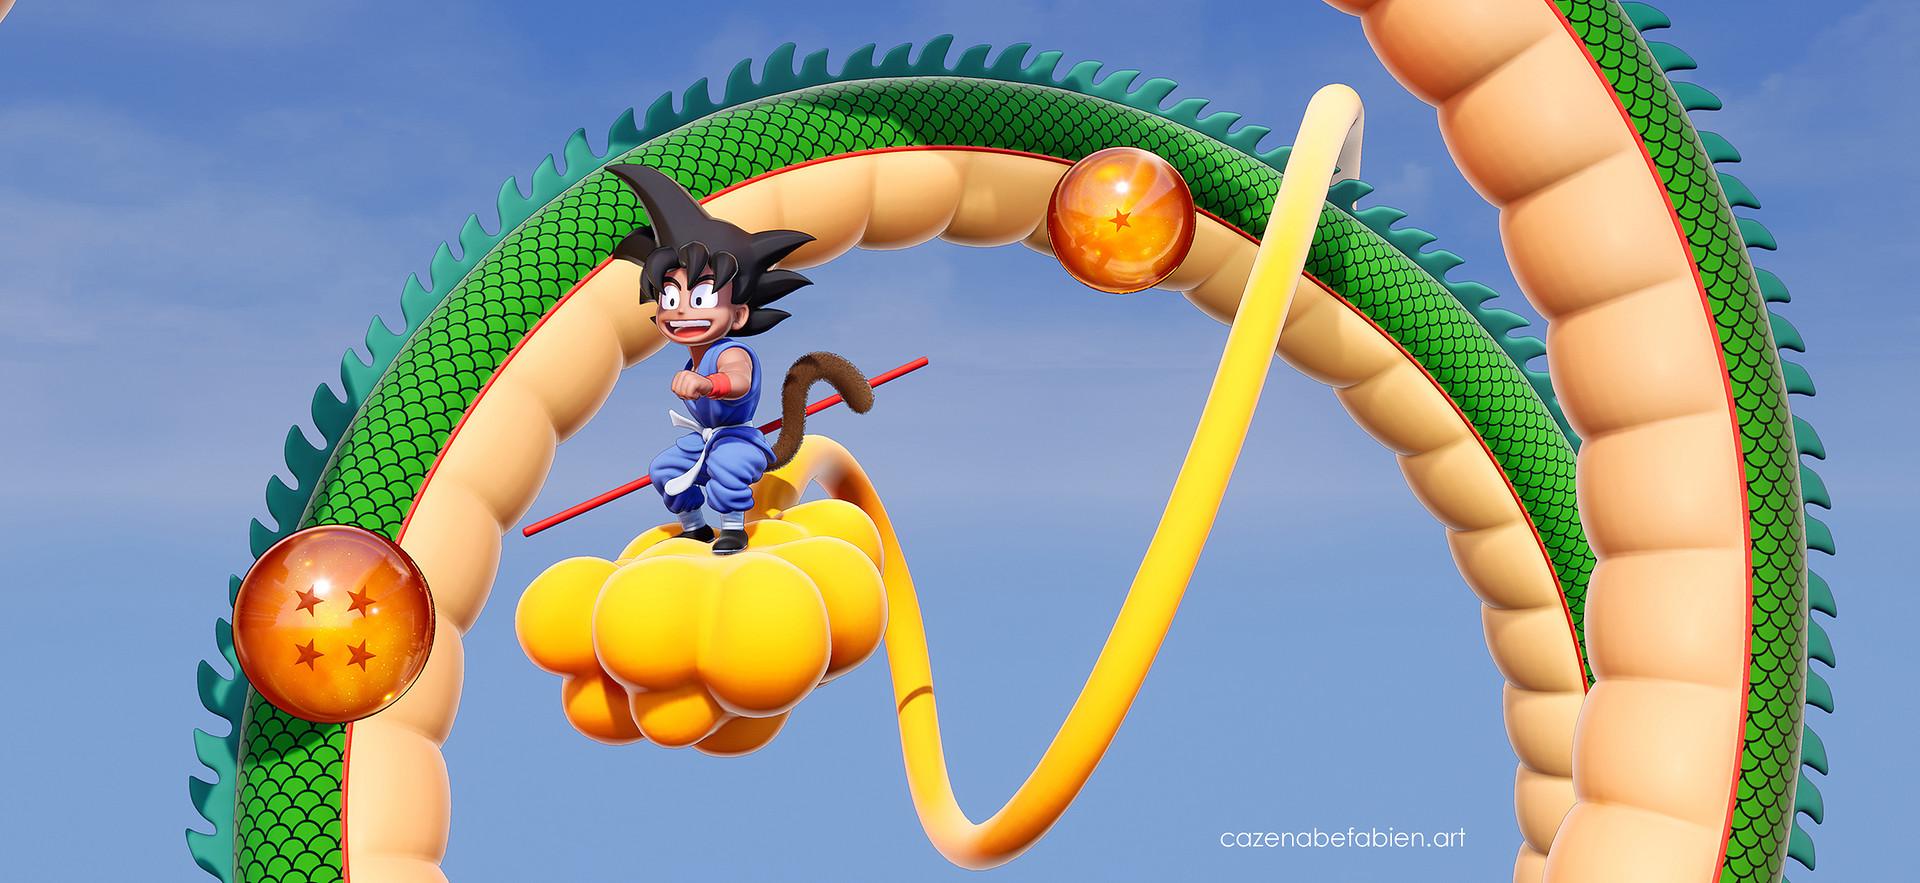 Fabien cazenabe sangoku dragon ball sculpt zbrush unreal 3d 14